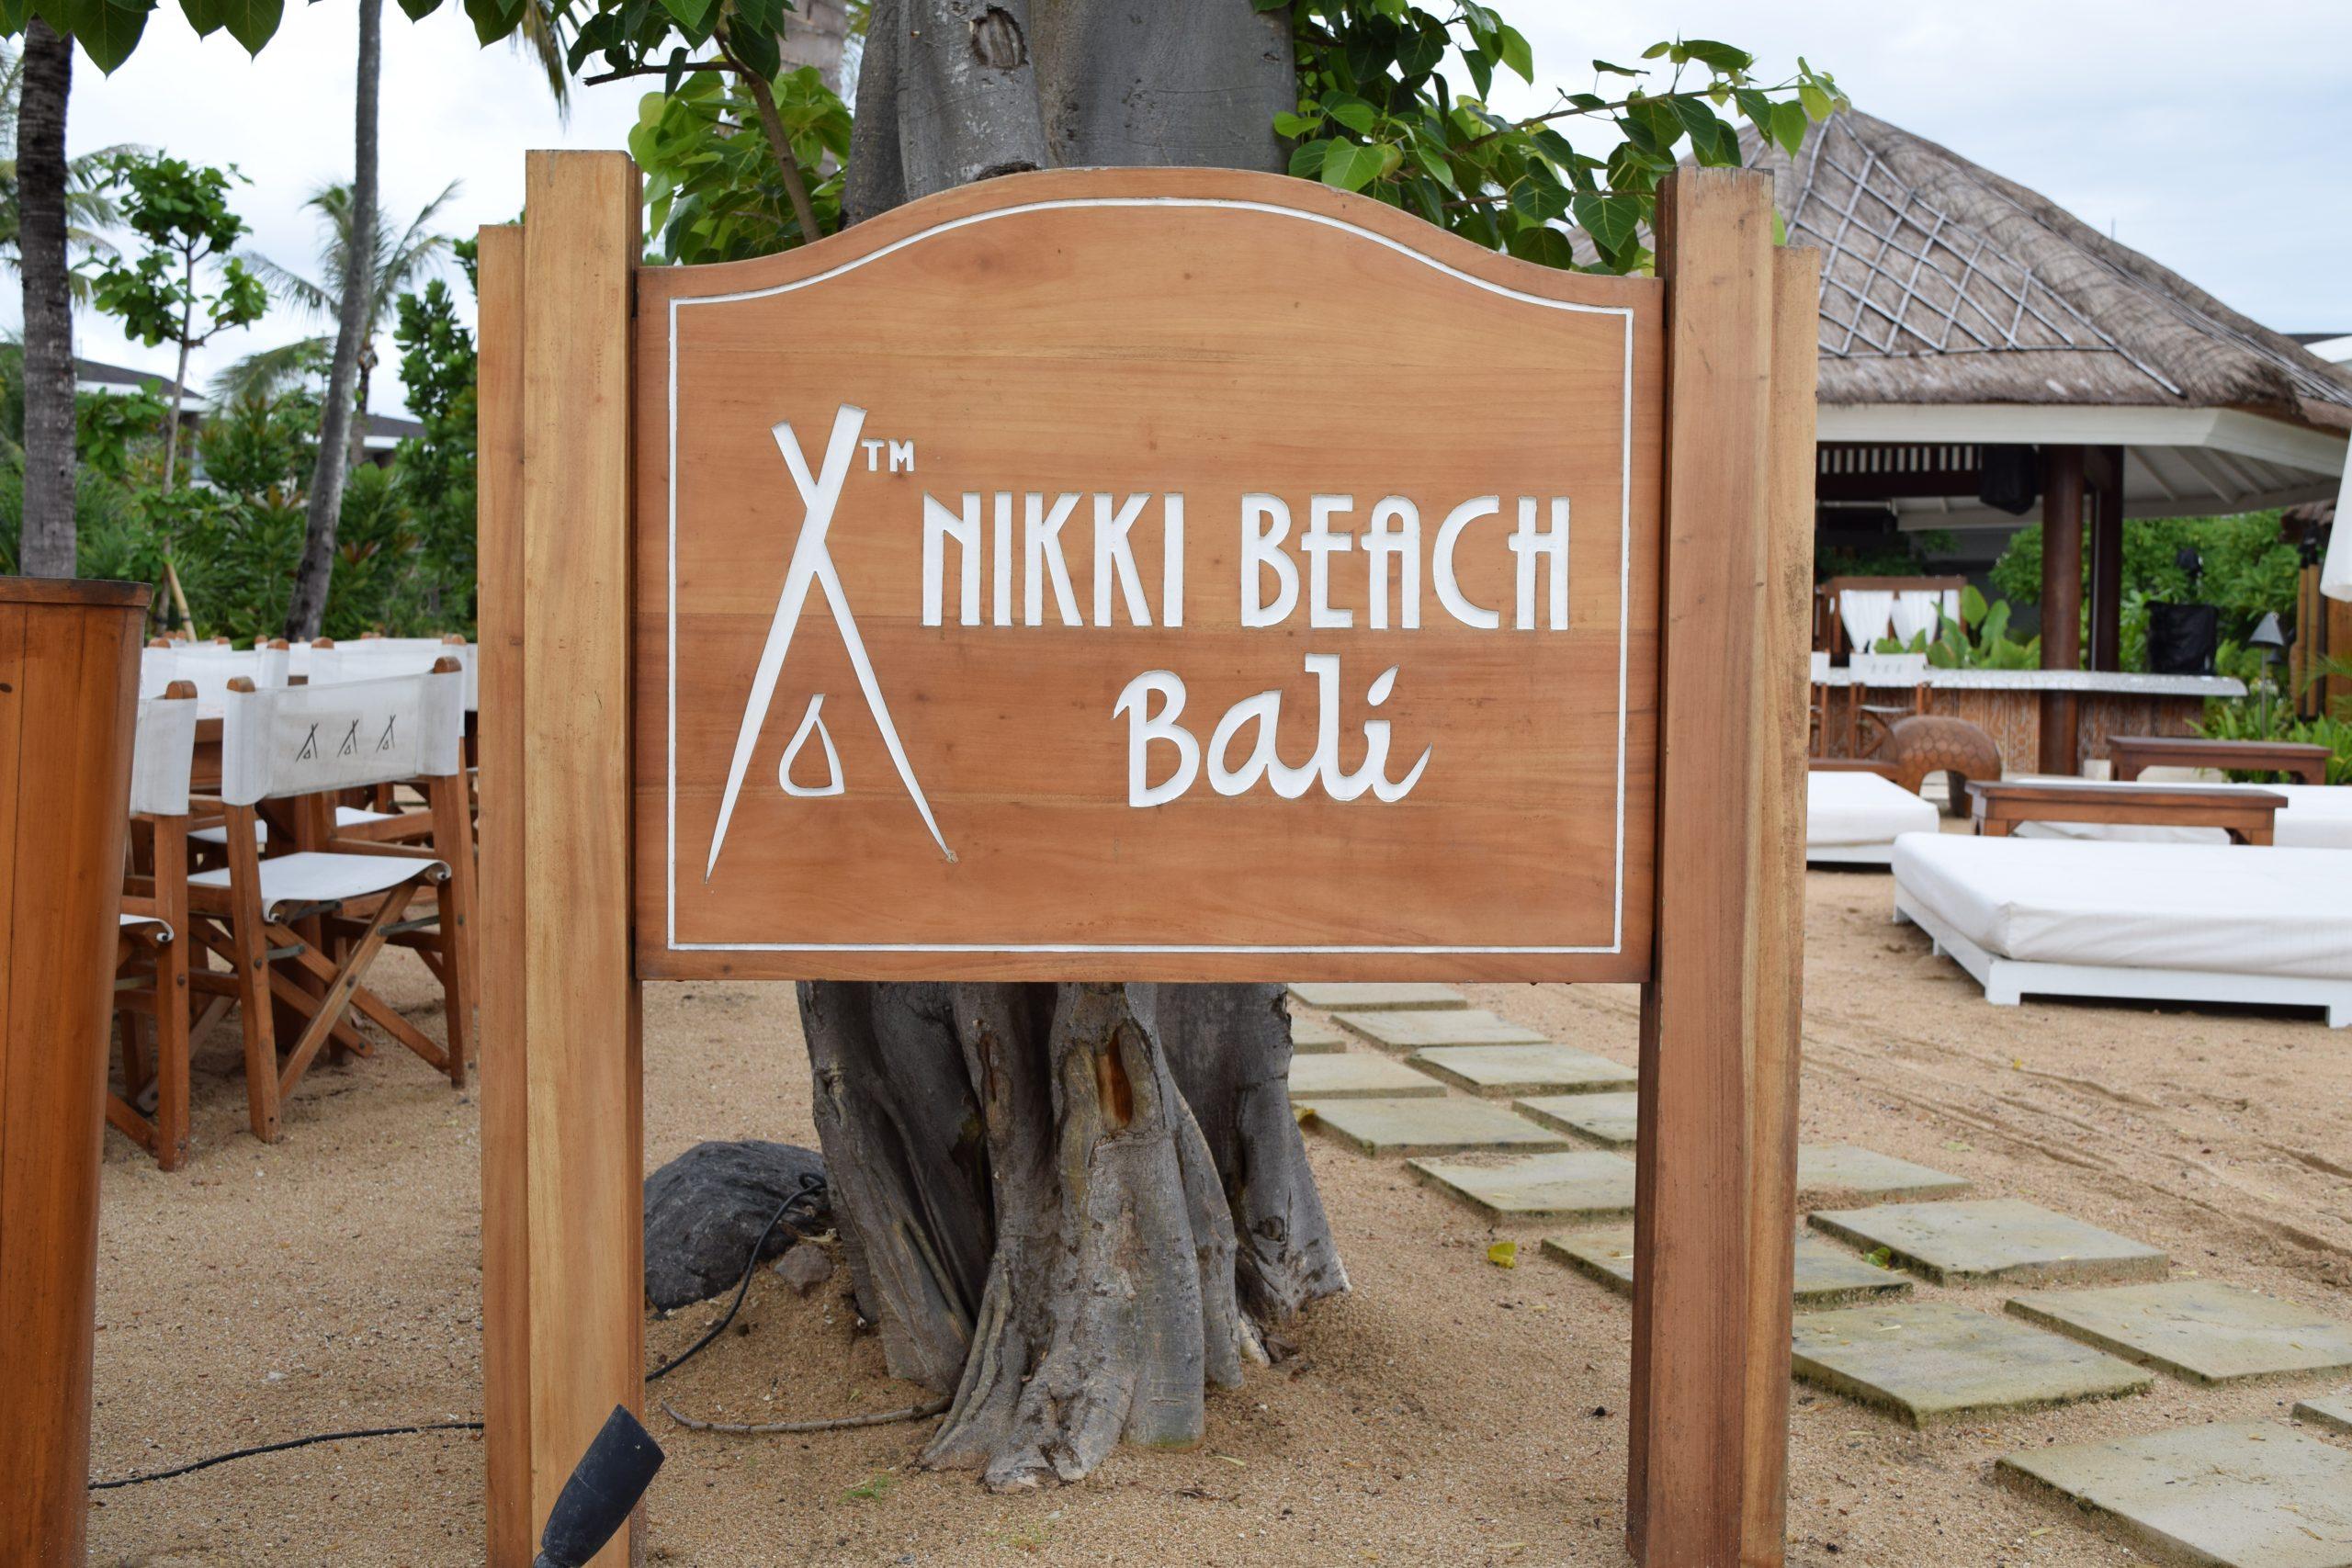 Nikki Beach Bali Signboard